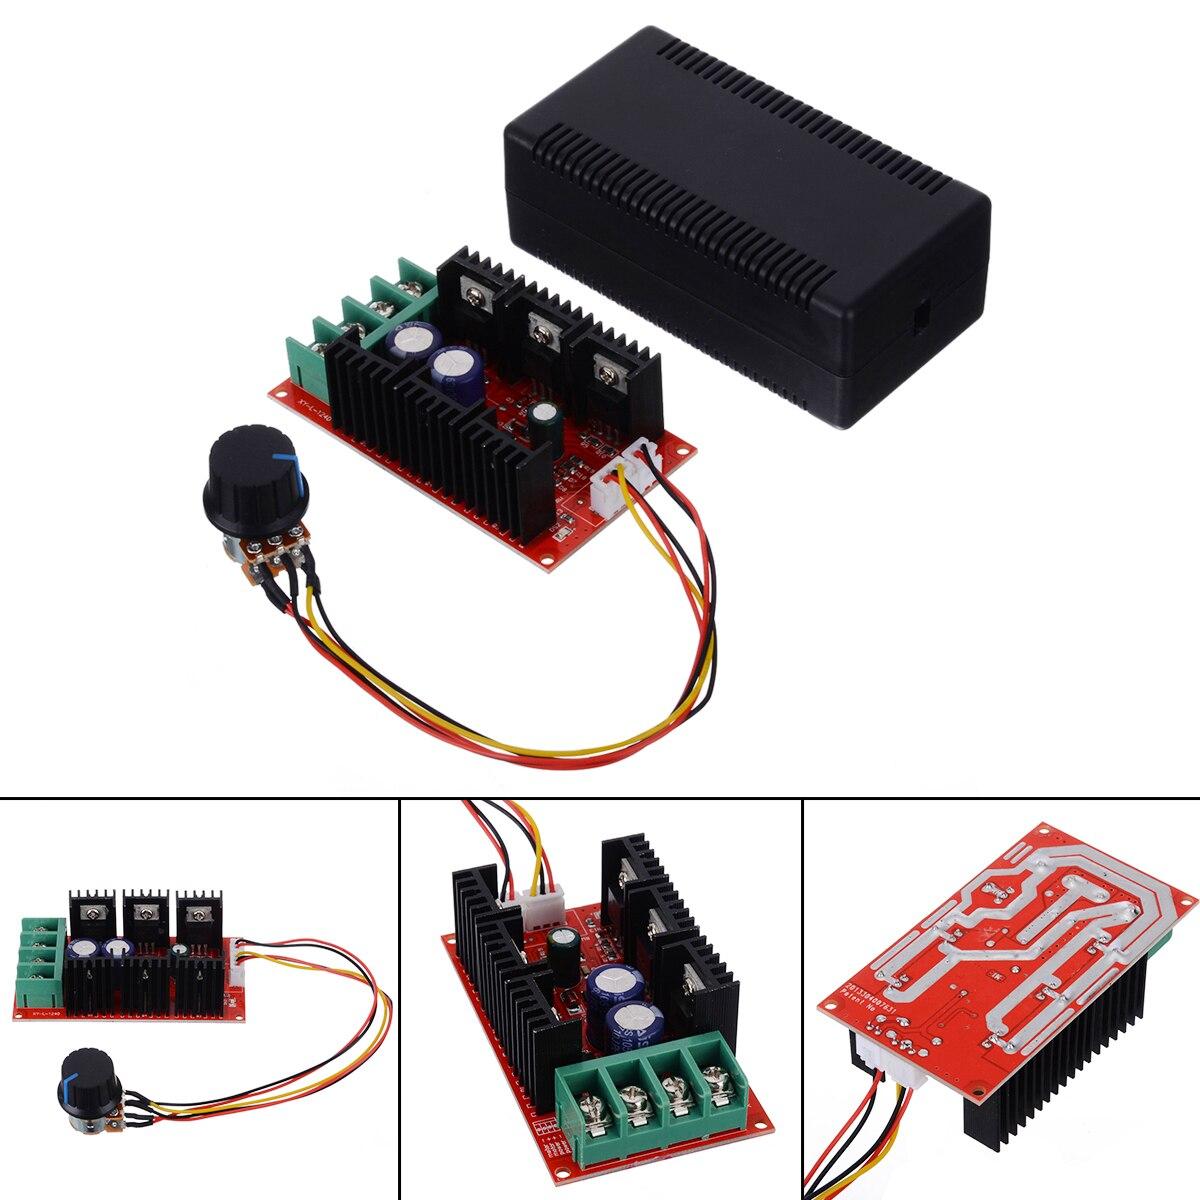 New 9-50V 2000W 40A Motor Speed Control Module PWM HHO RC Controller DC 12V 24V 48V  Motor Speed Control